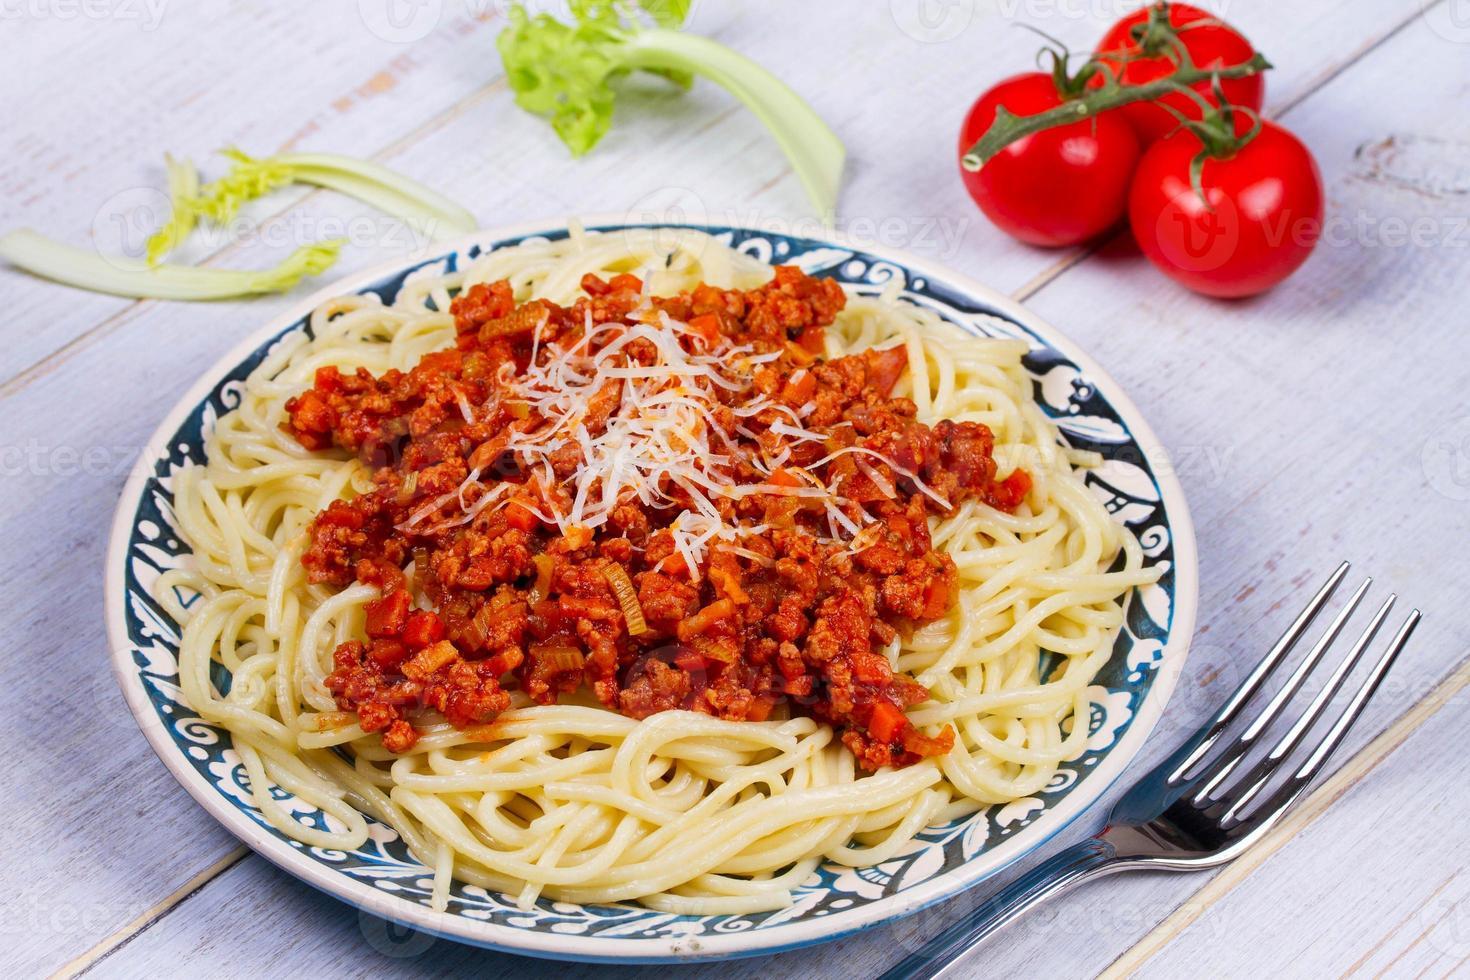 Spaghetti with Bolognese Sauce photo